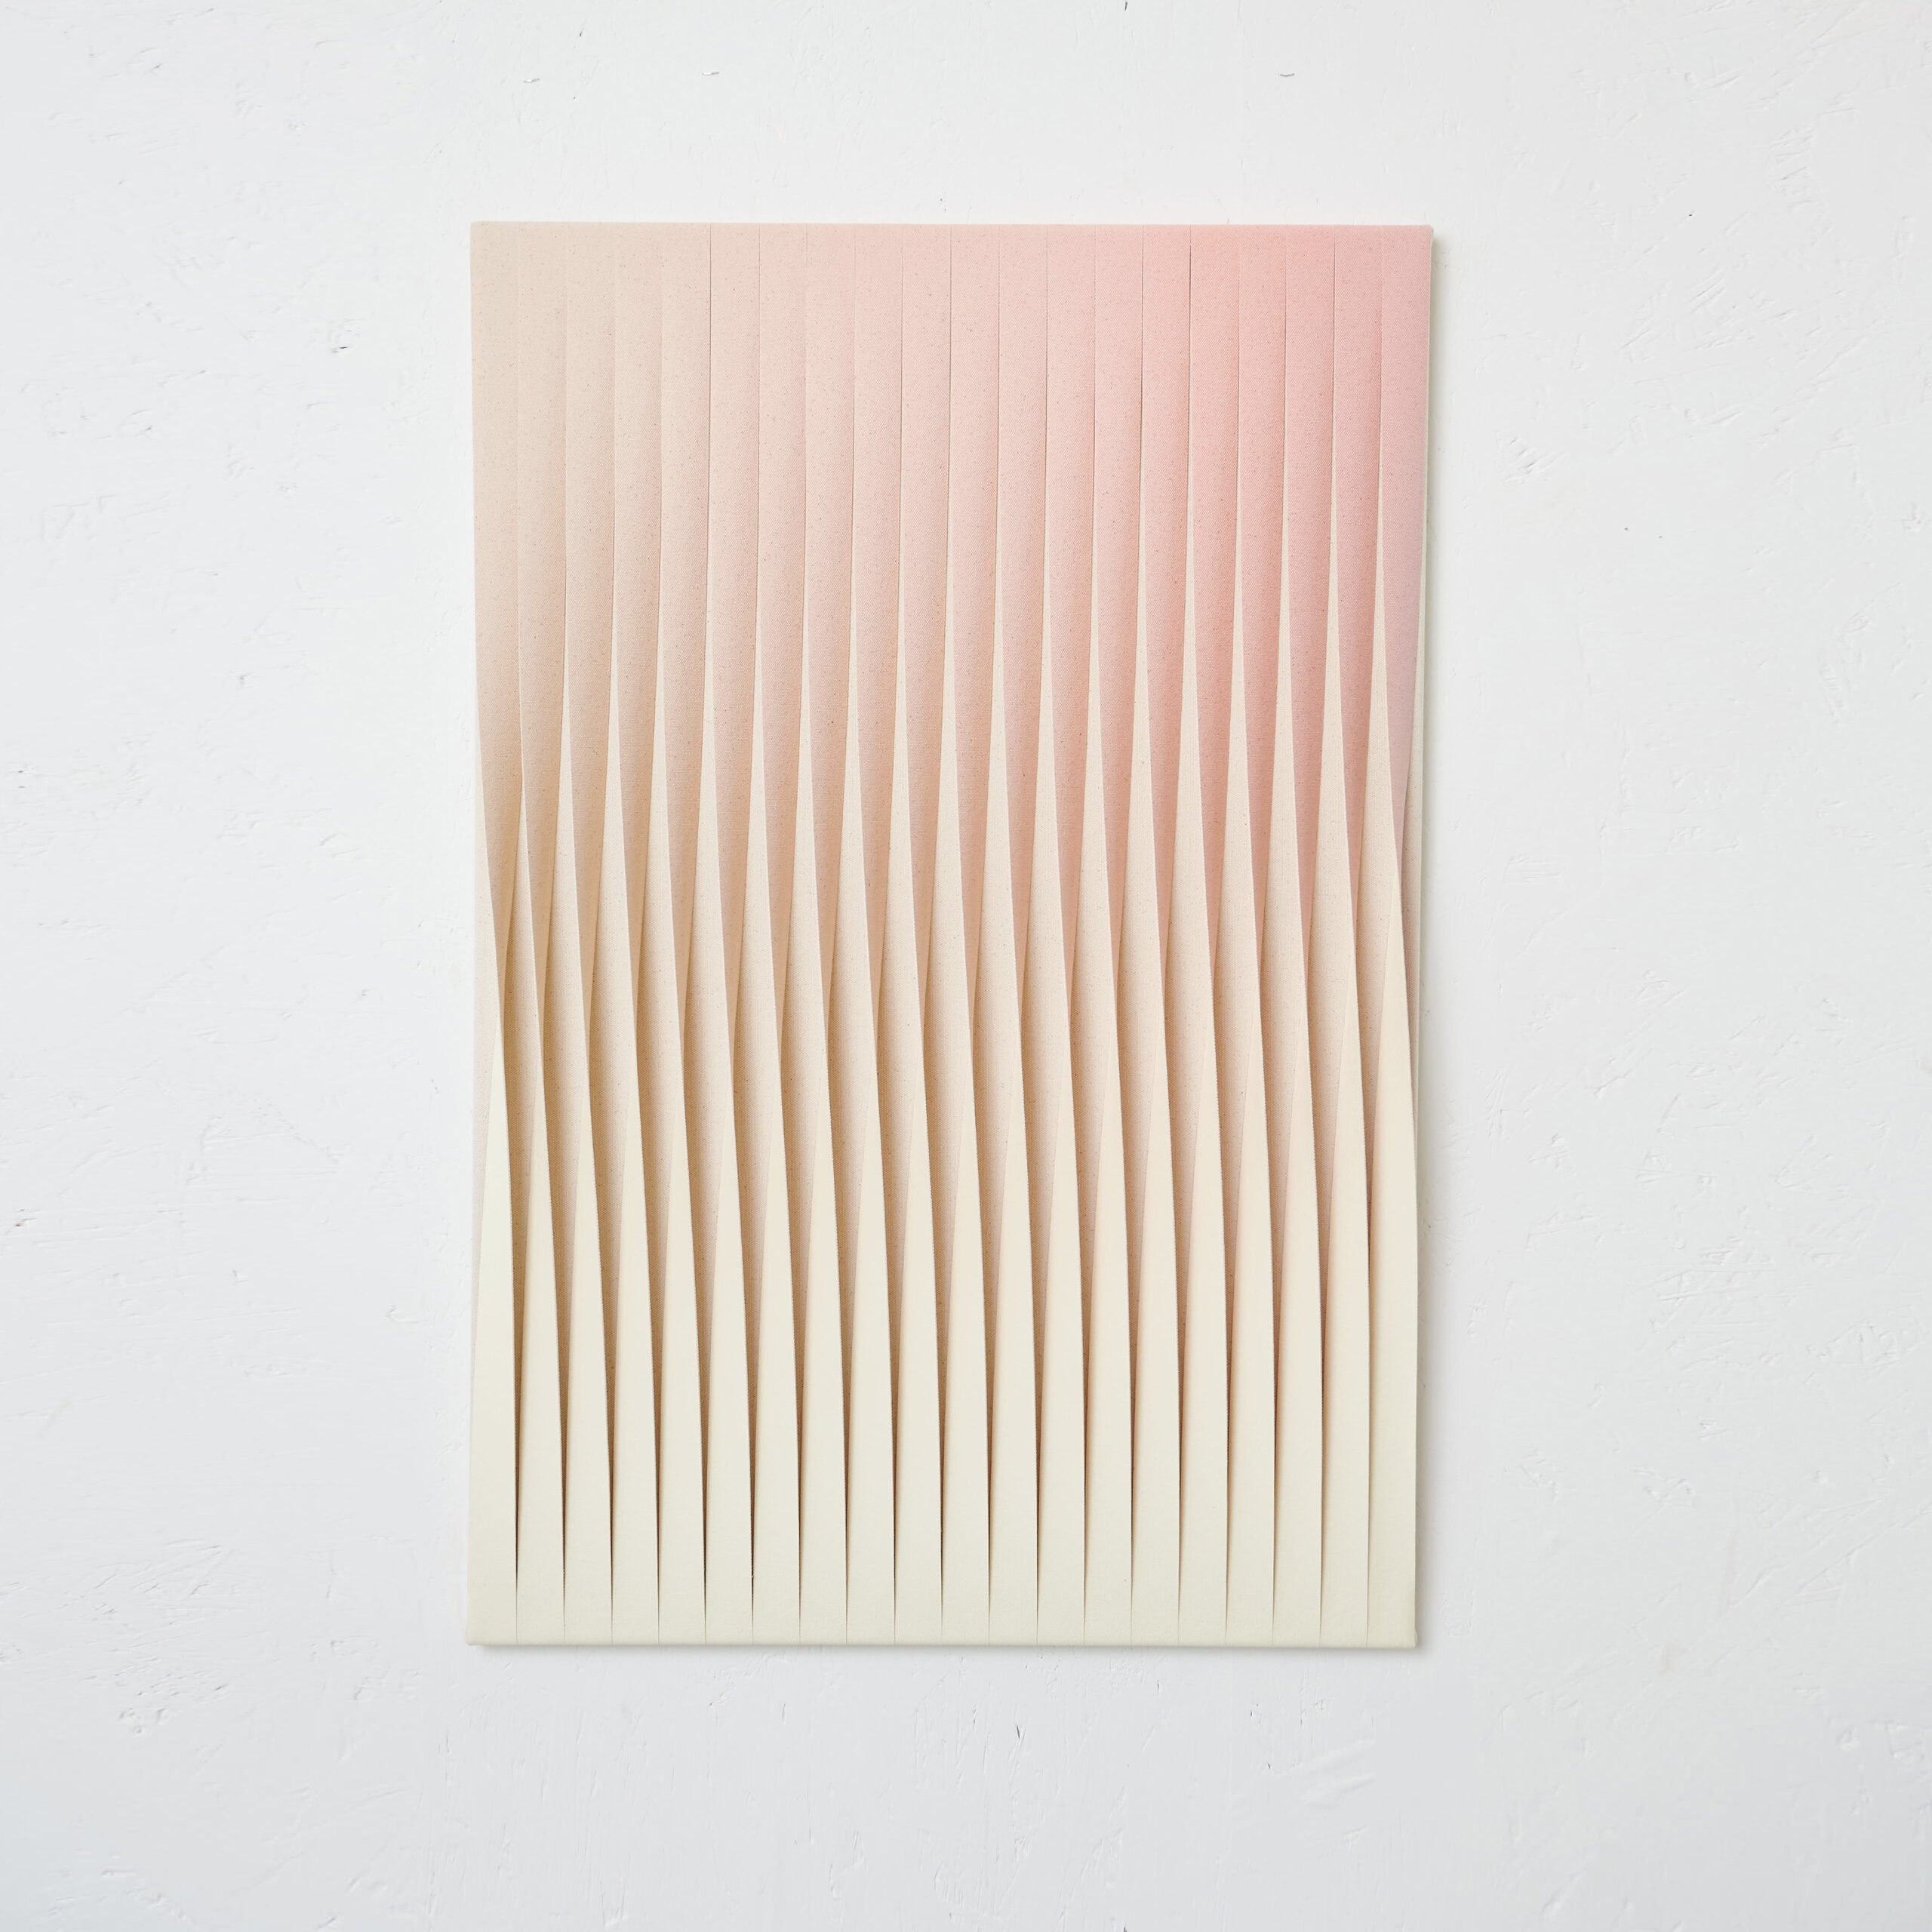 502048-90×60-16.800-acrylic-raw-canvas3